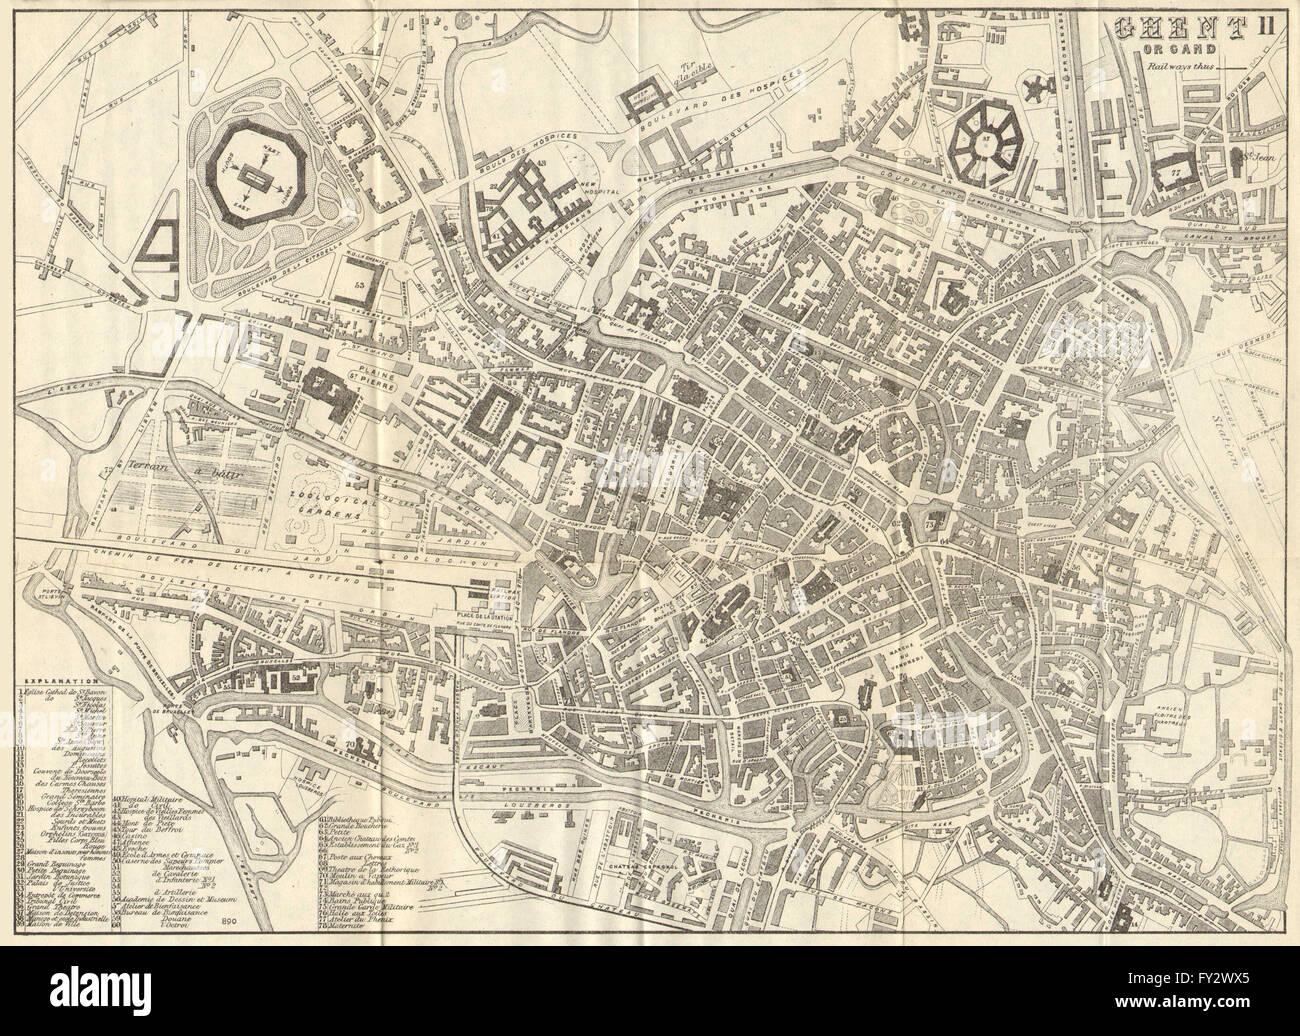 GHENT GENT GAND Antique town plan City map Belgium BRADSHAW